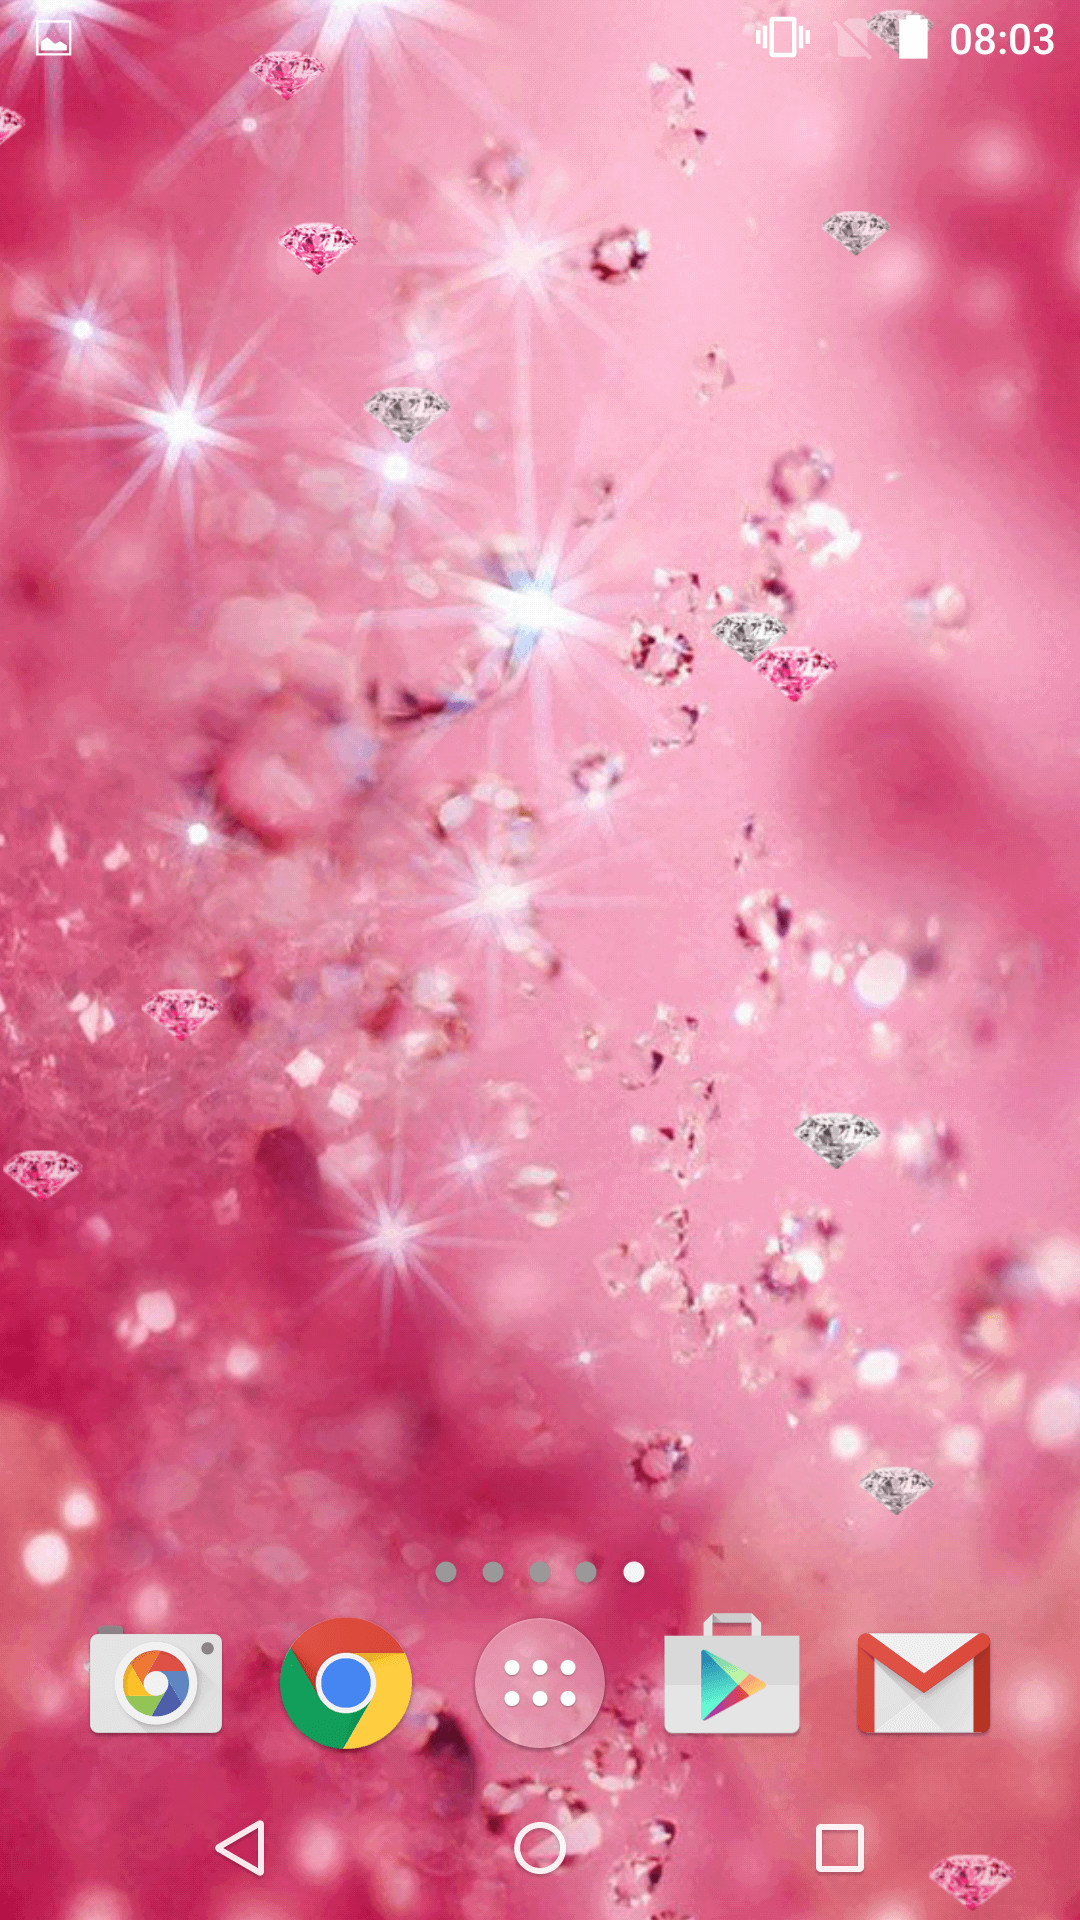 Res: 1080x1920, Pink Diamonds Live Wallpaper Apk Personalization Screenshot Coloring Book  Environmentally Friendly Carpet Custom Office Widescreen Hd For Computer